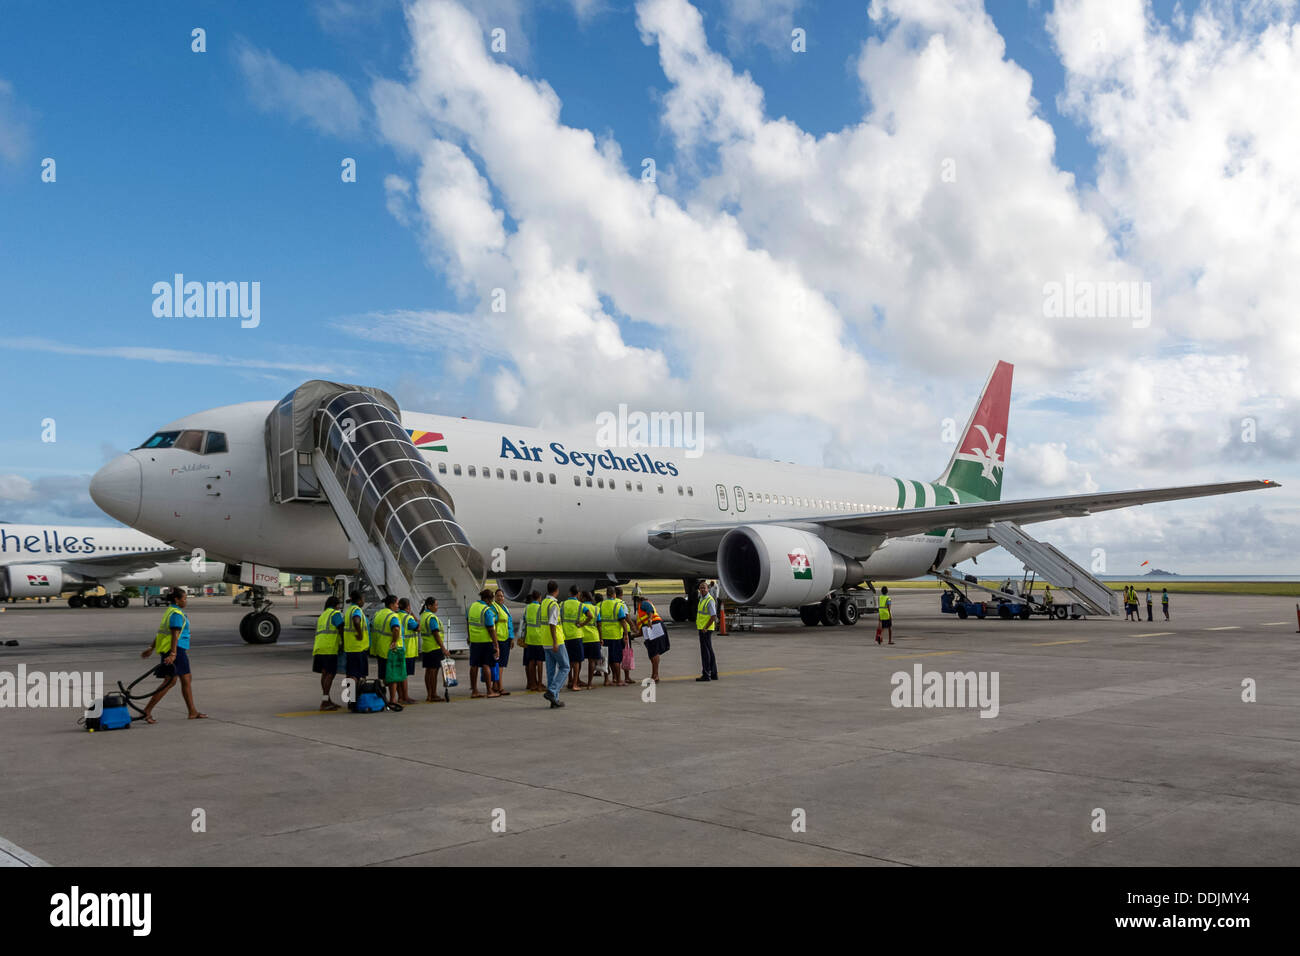 Air Sechelles, Praslin Airport, Seychelles - Stock Image